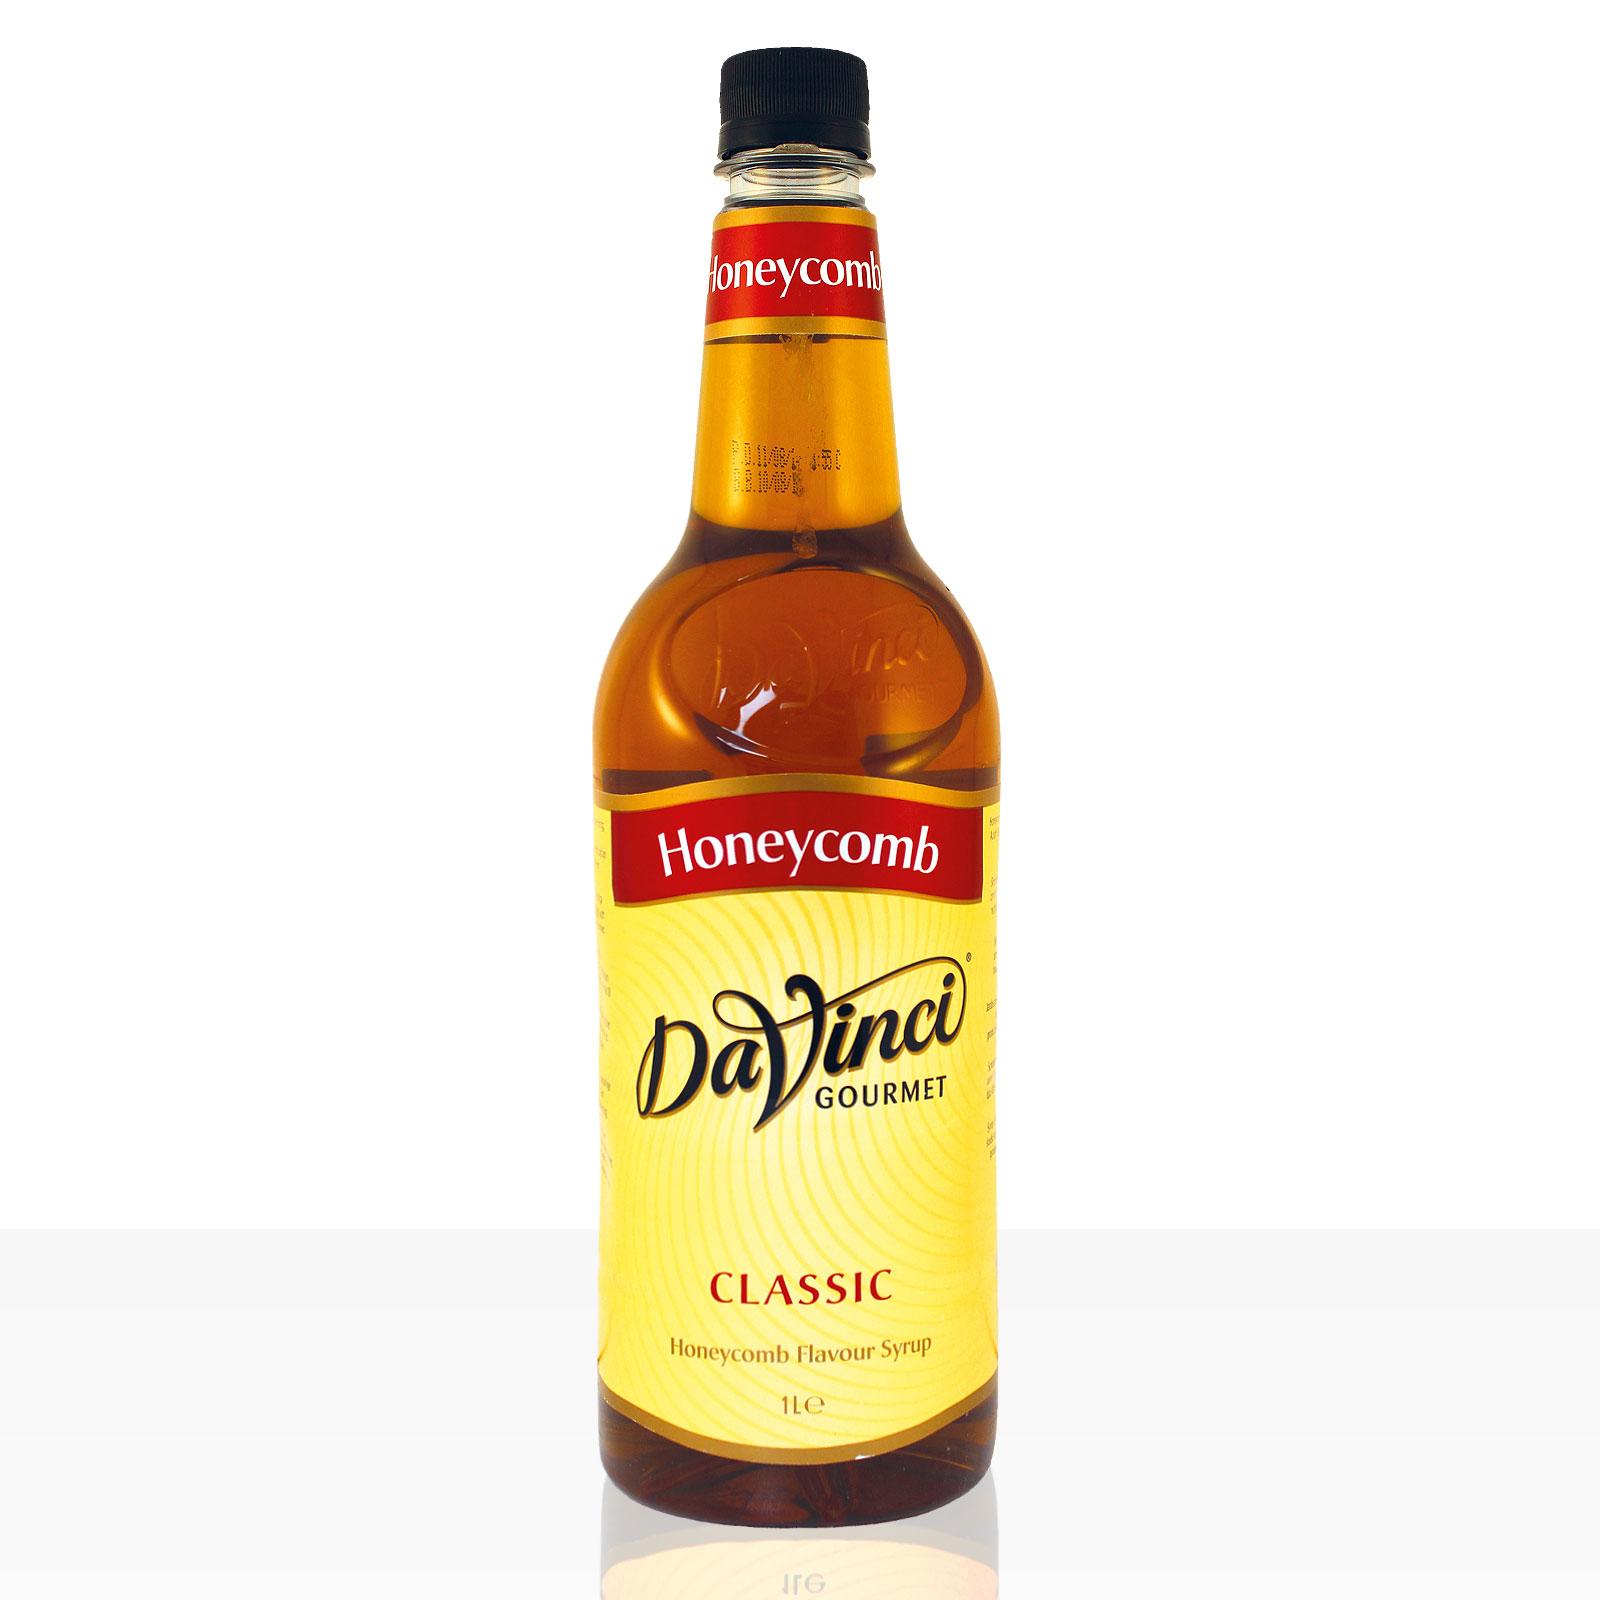 Da Vinci Gourmet Sirup Honeycomb 6 x 1000ml